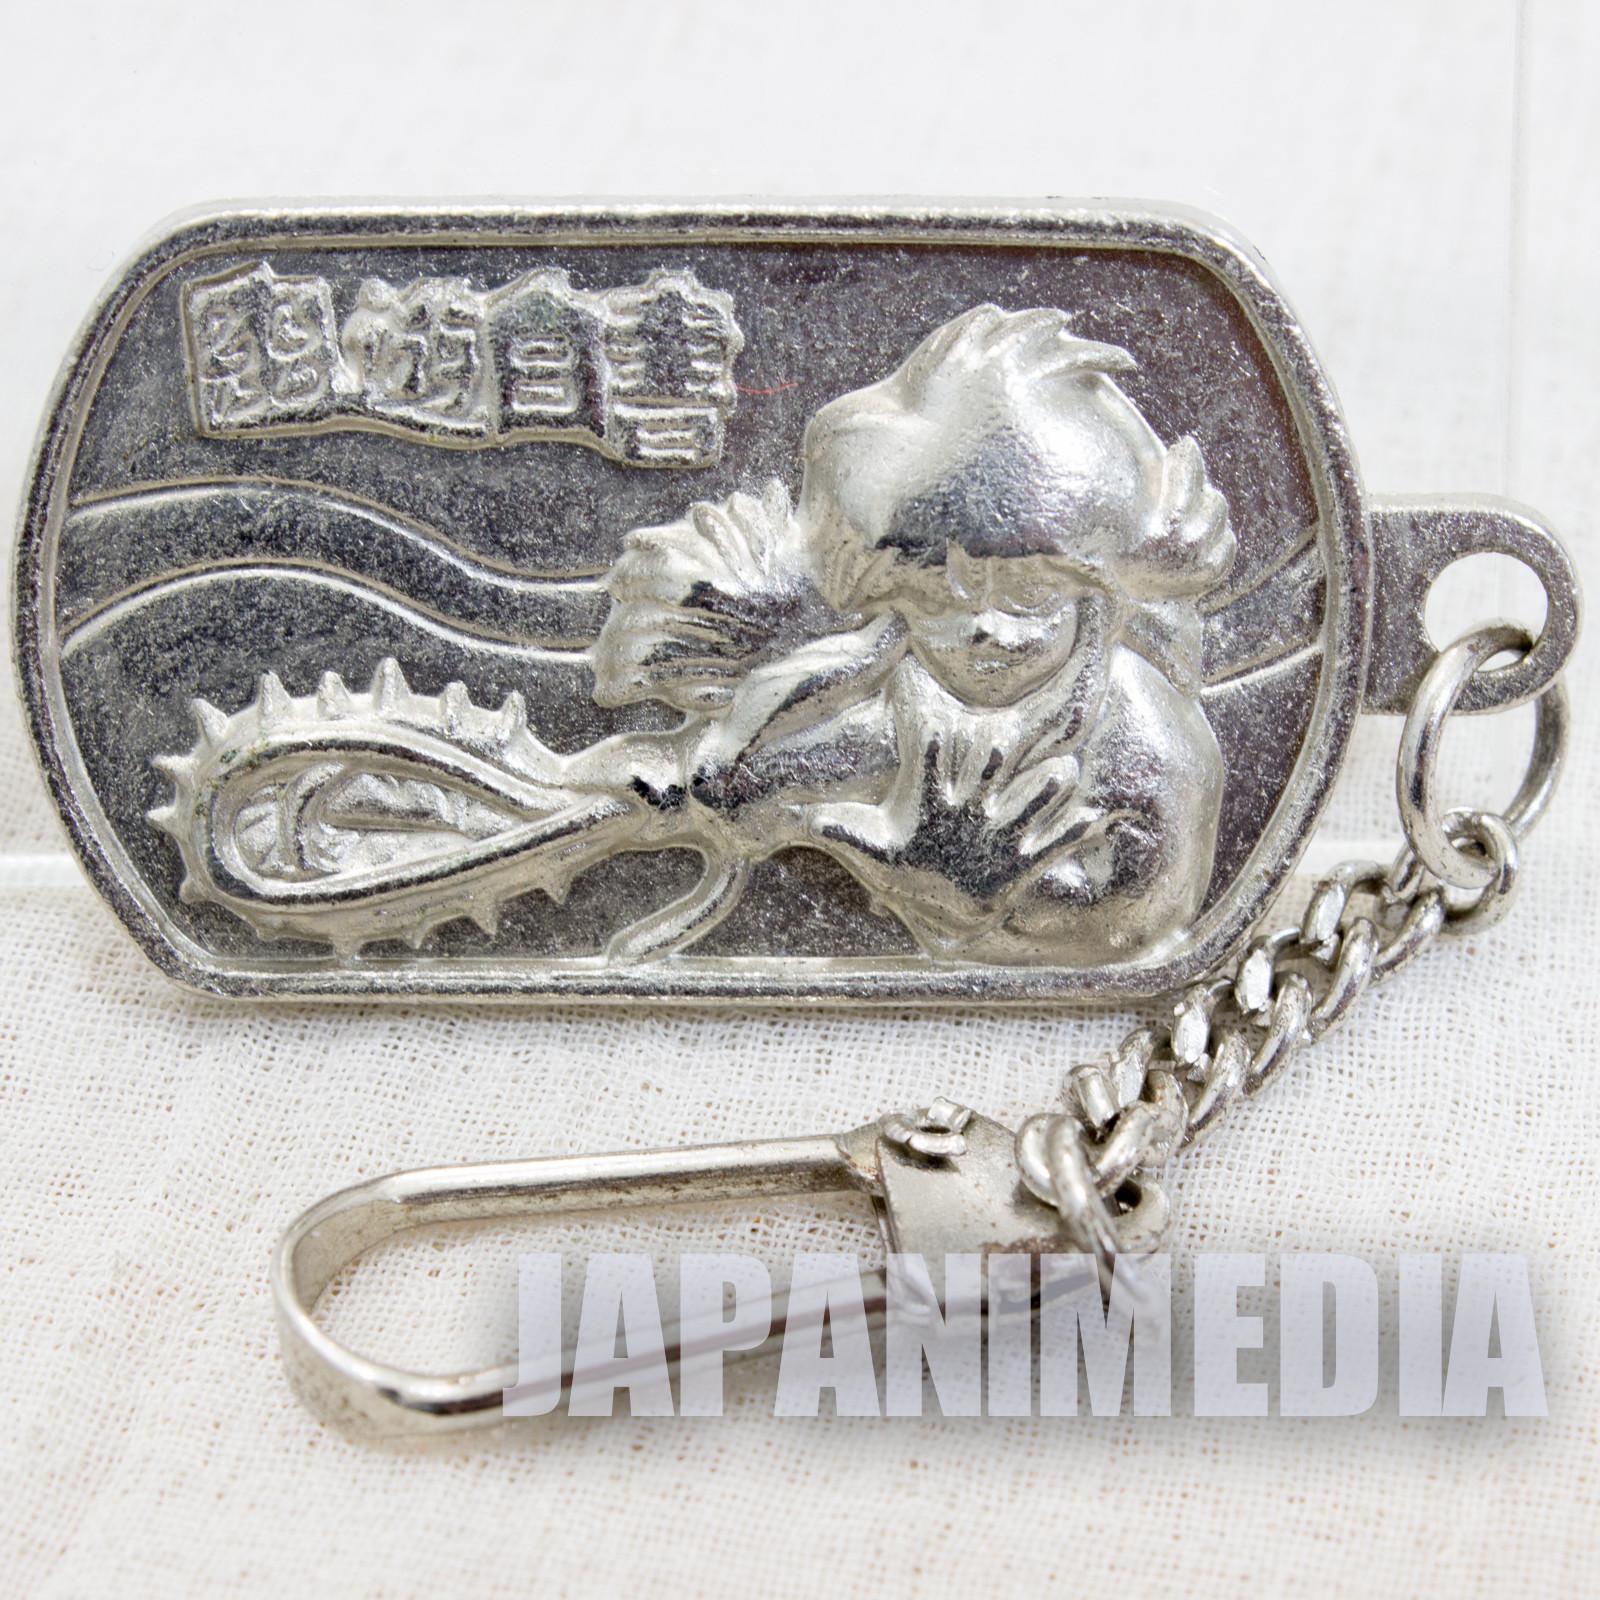 Retro RARE! Yu Yu Hakusho Kurama Plate Keychain JAPAN ANIME MANGA